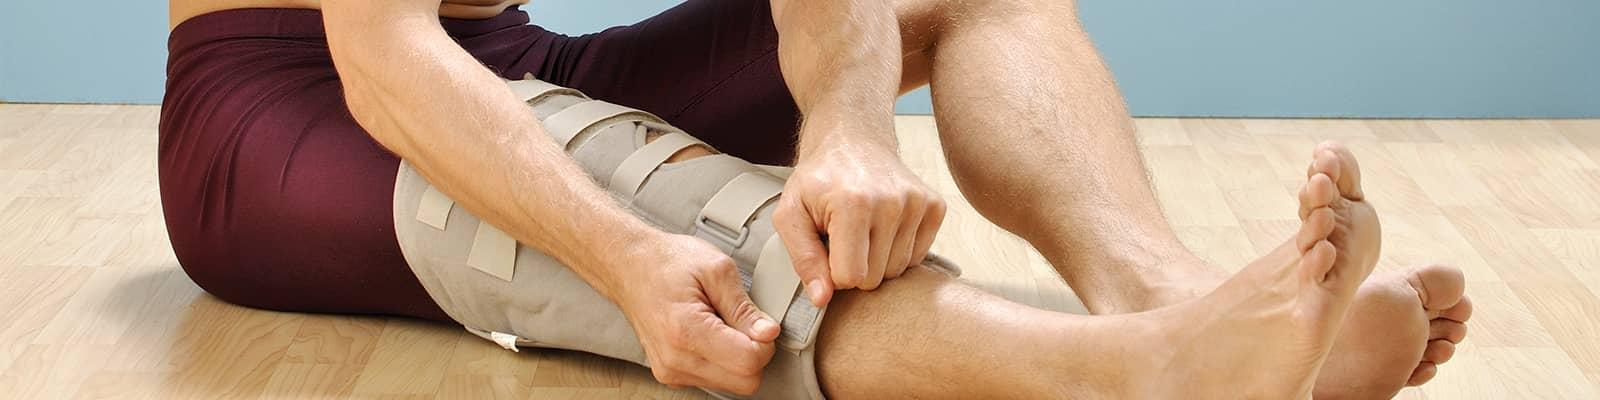 Rotura de menisco